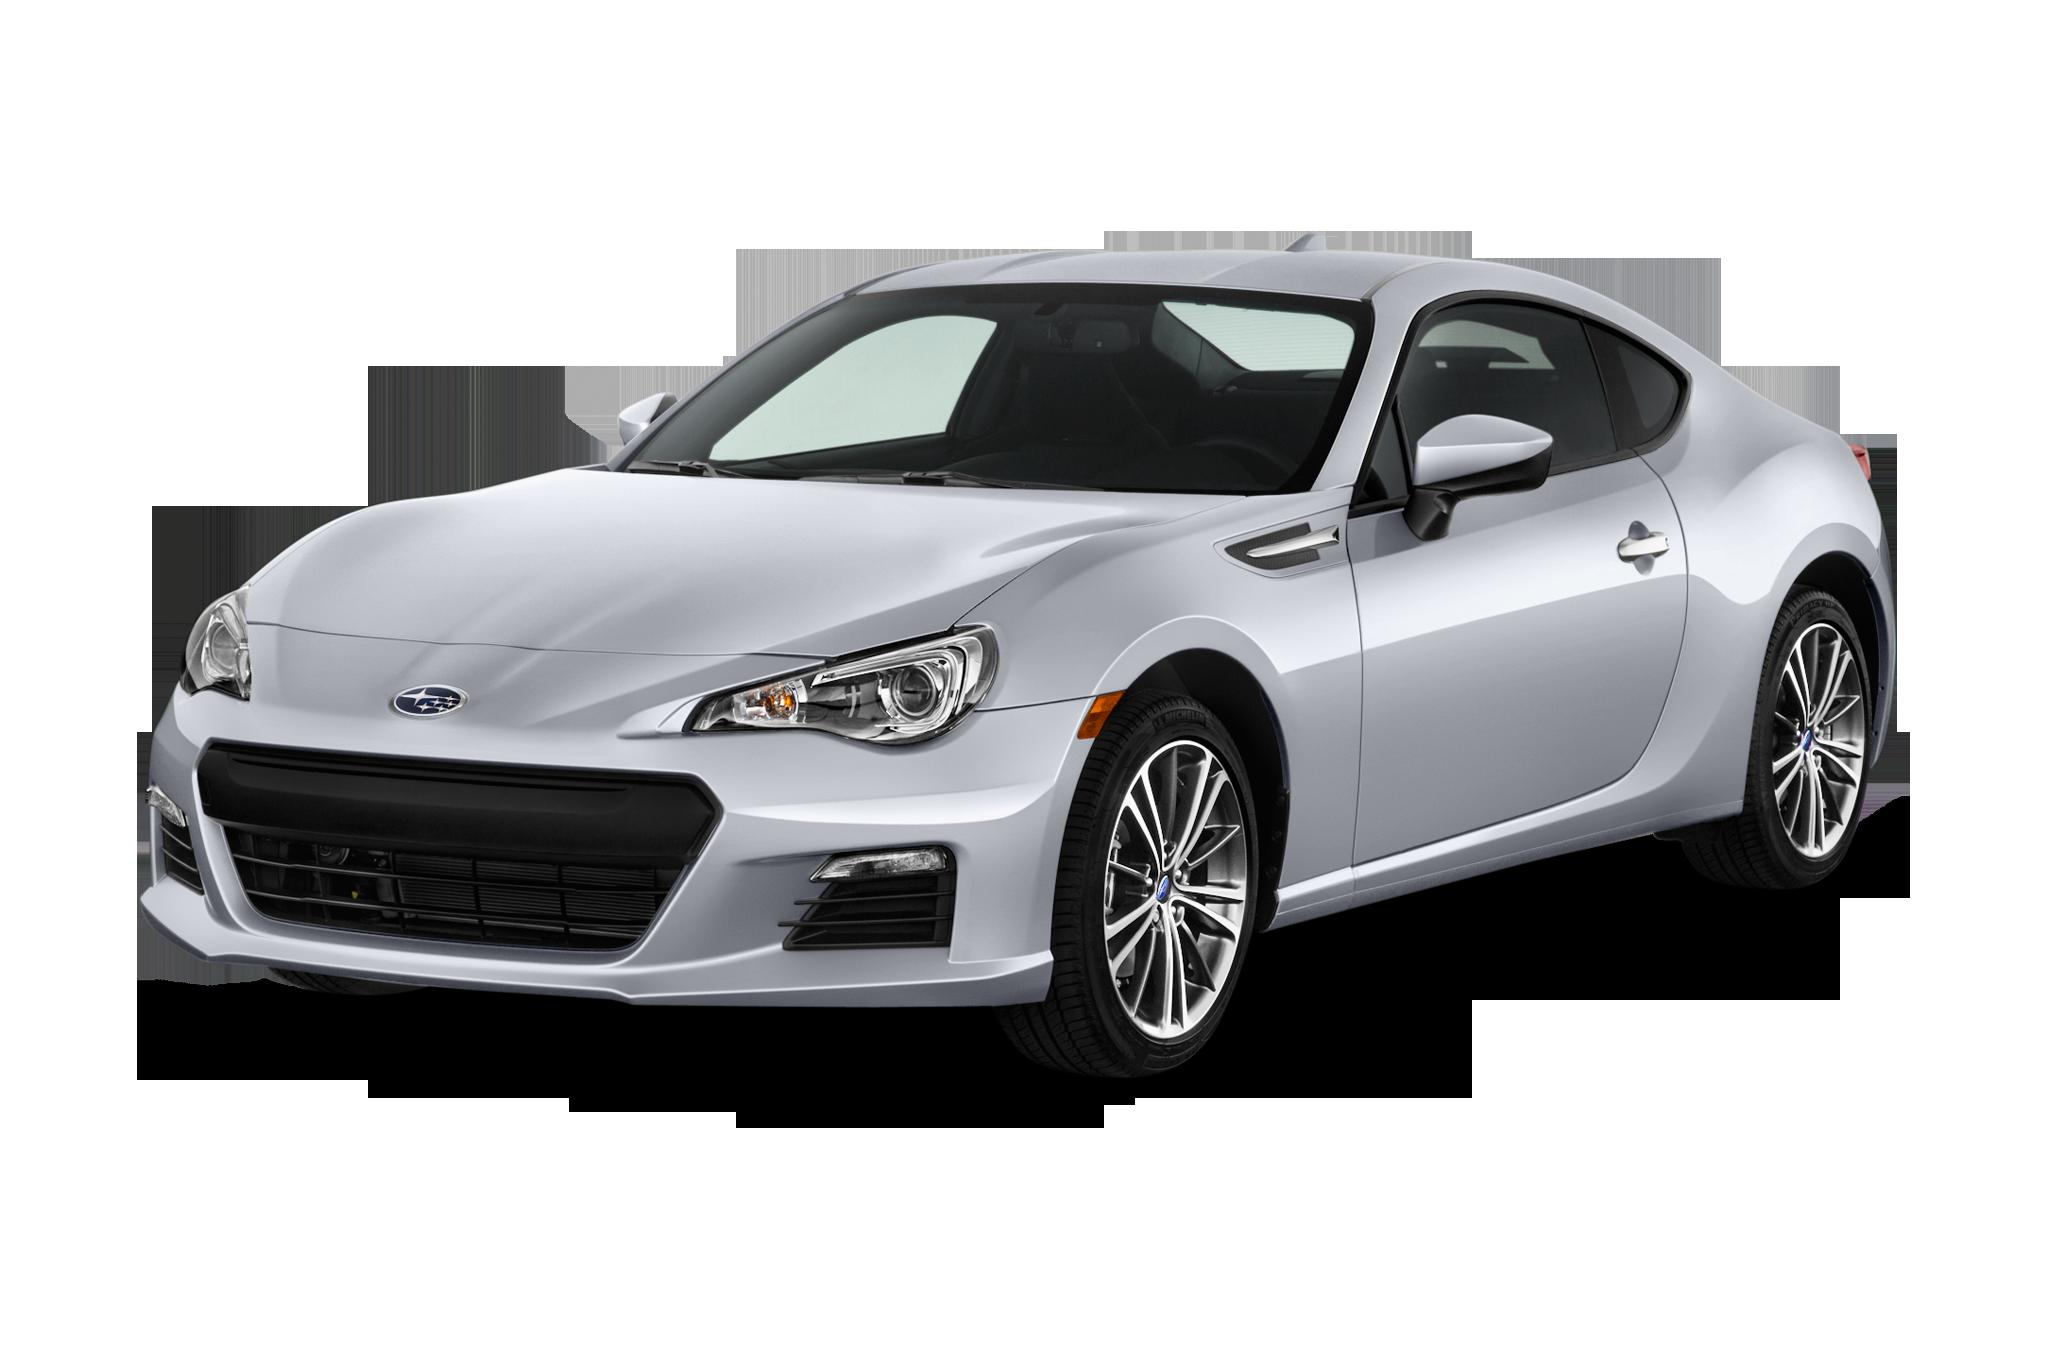 Subaru Confirms Updated Eyesight Debuting In U S For Model